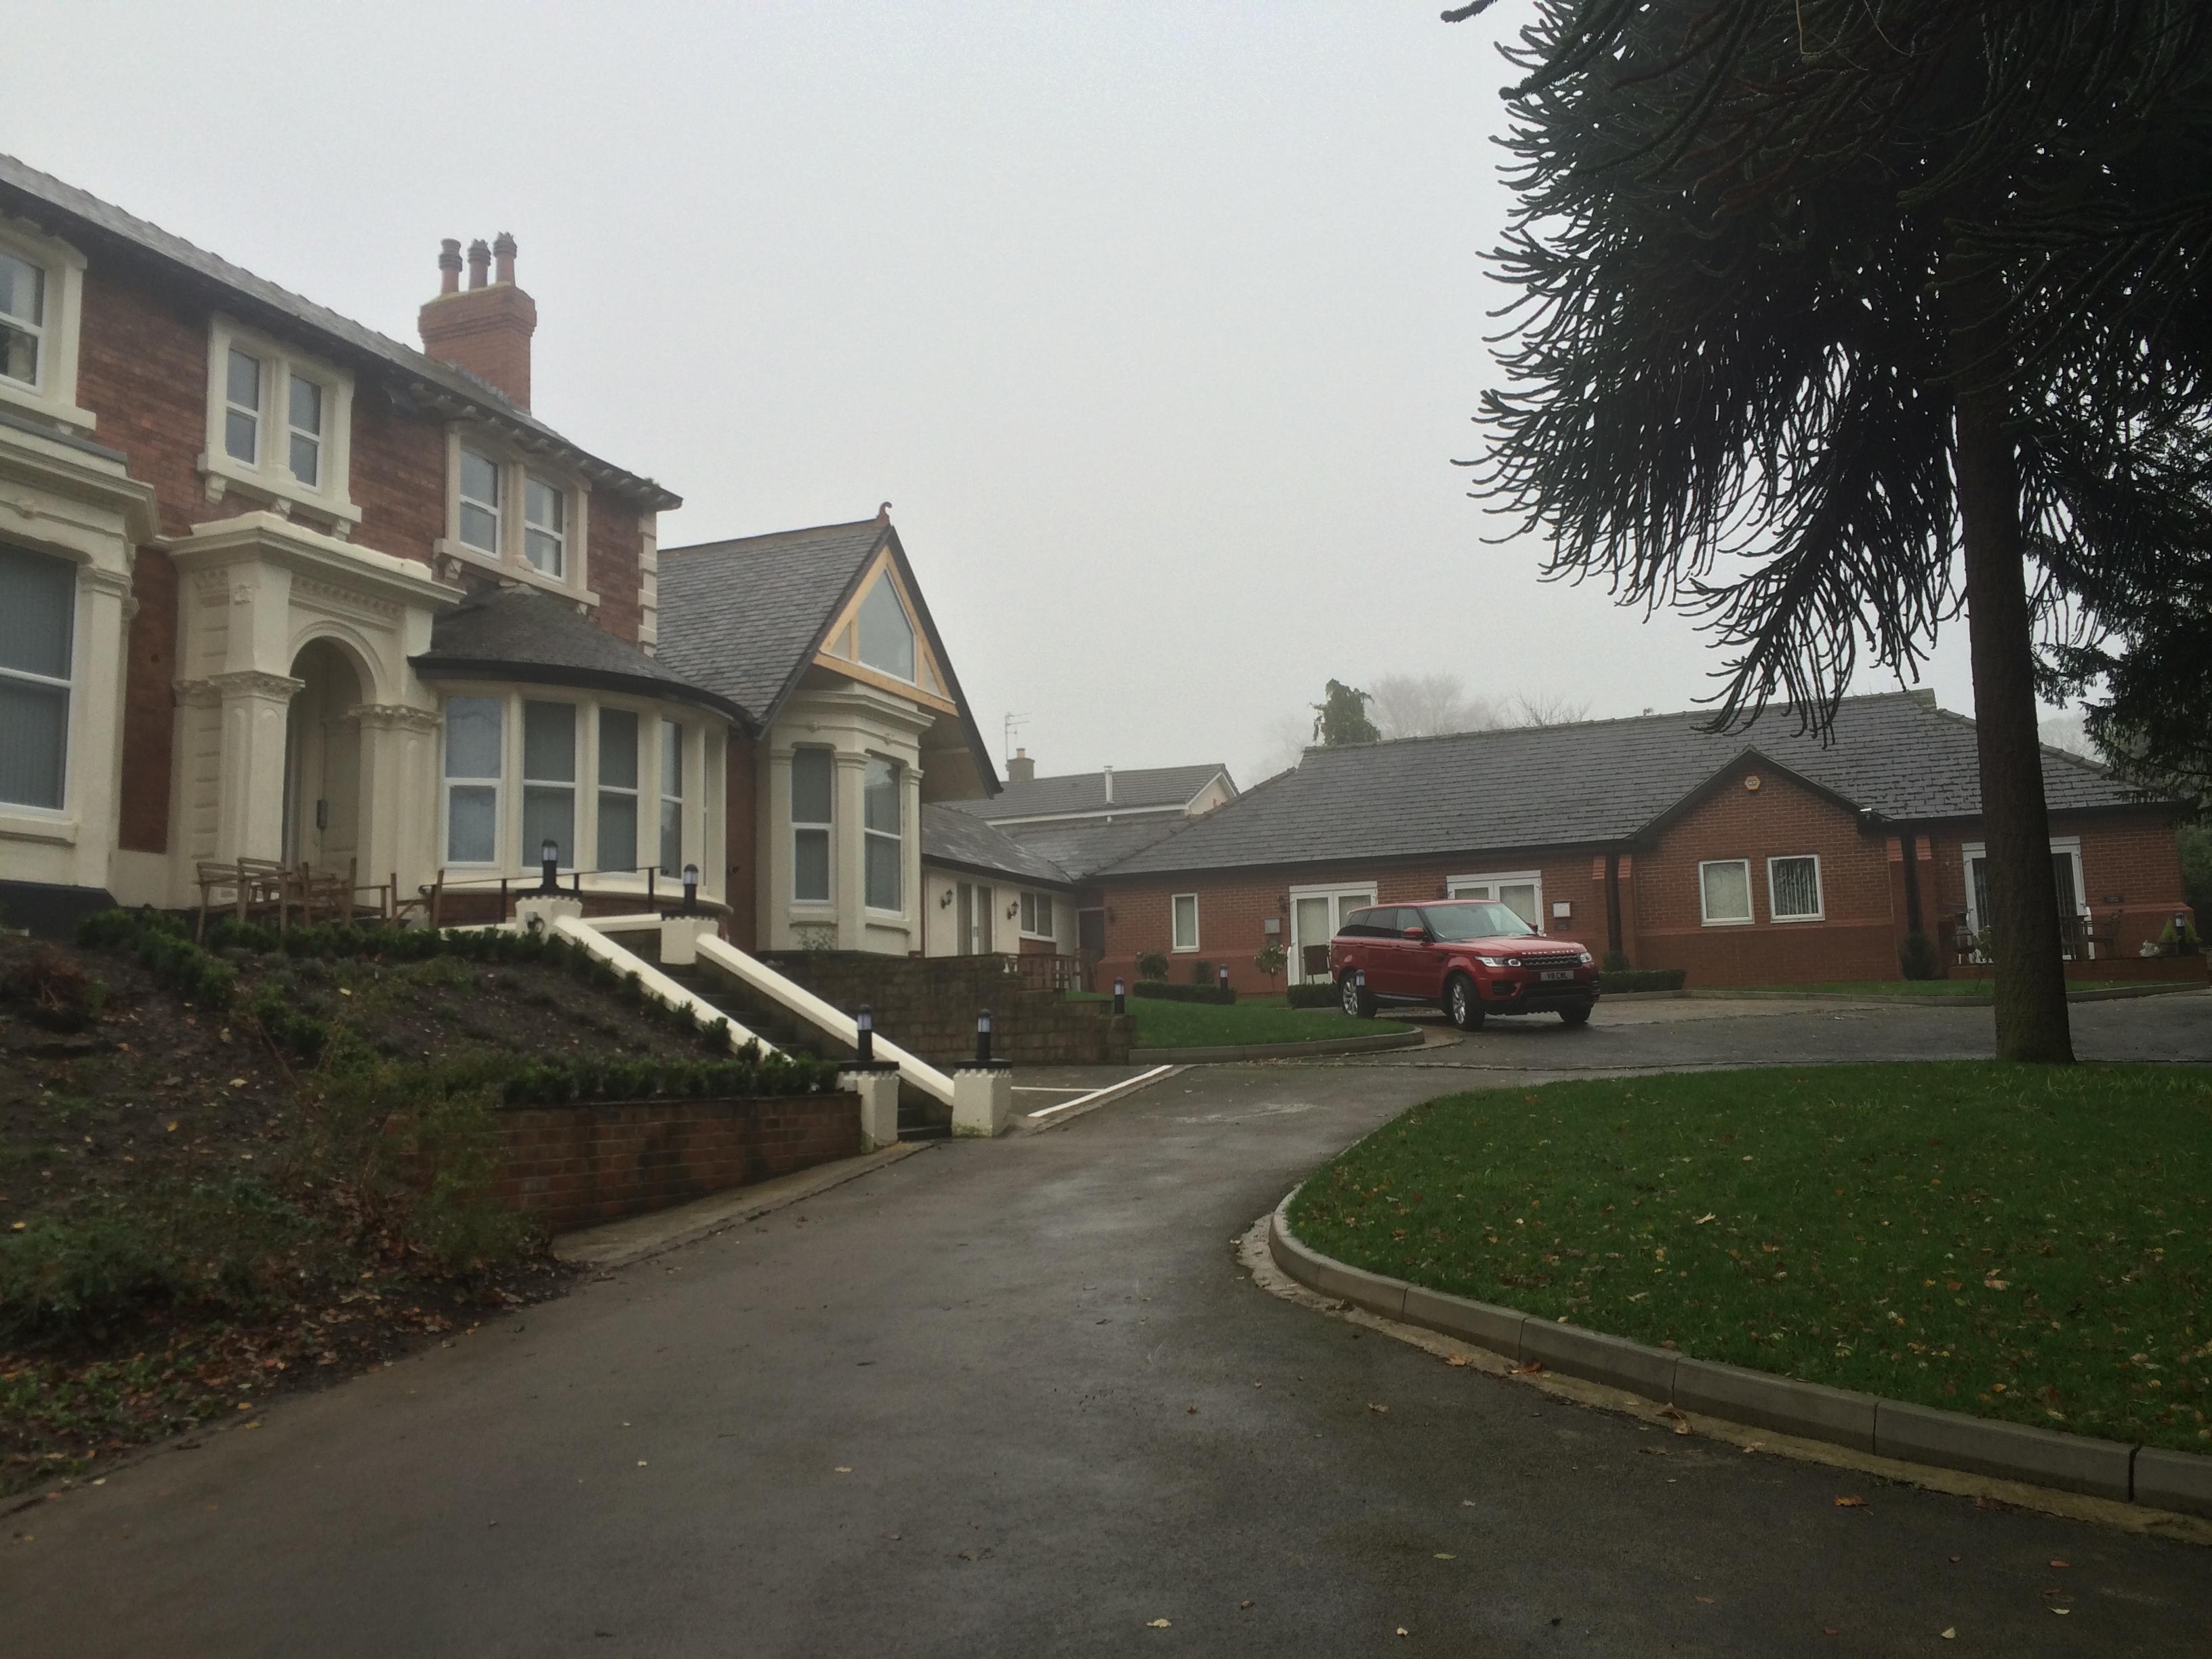 Elton Lodge